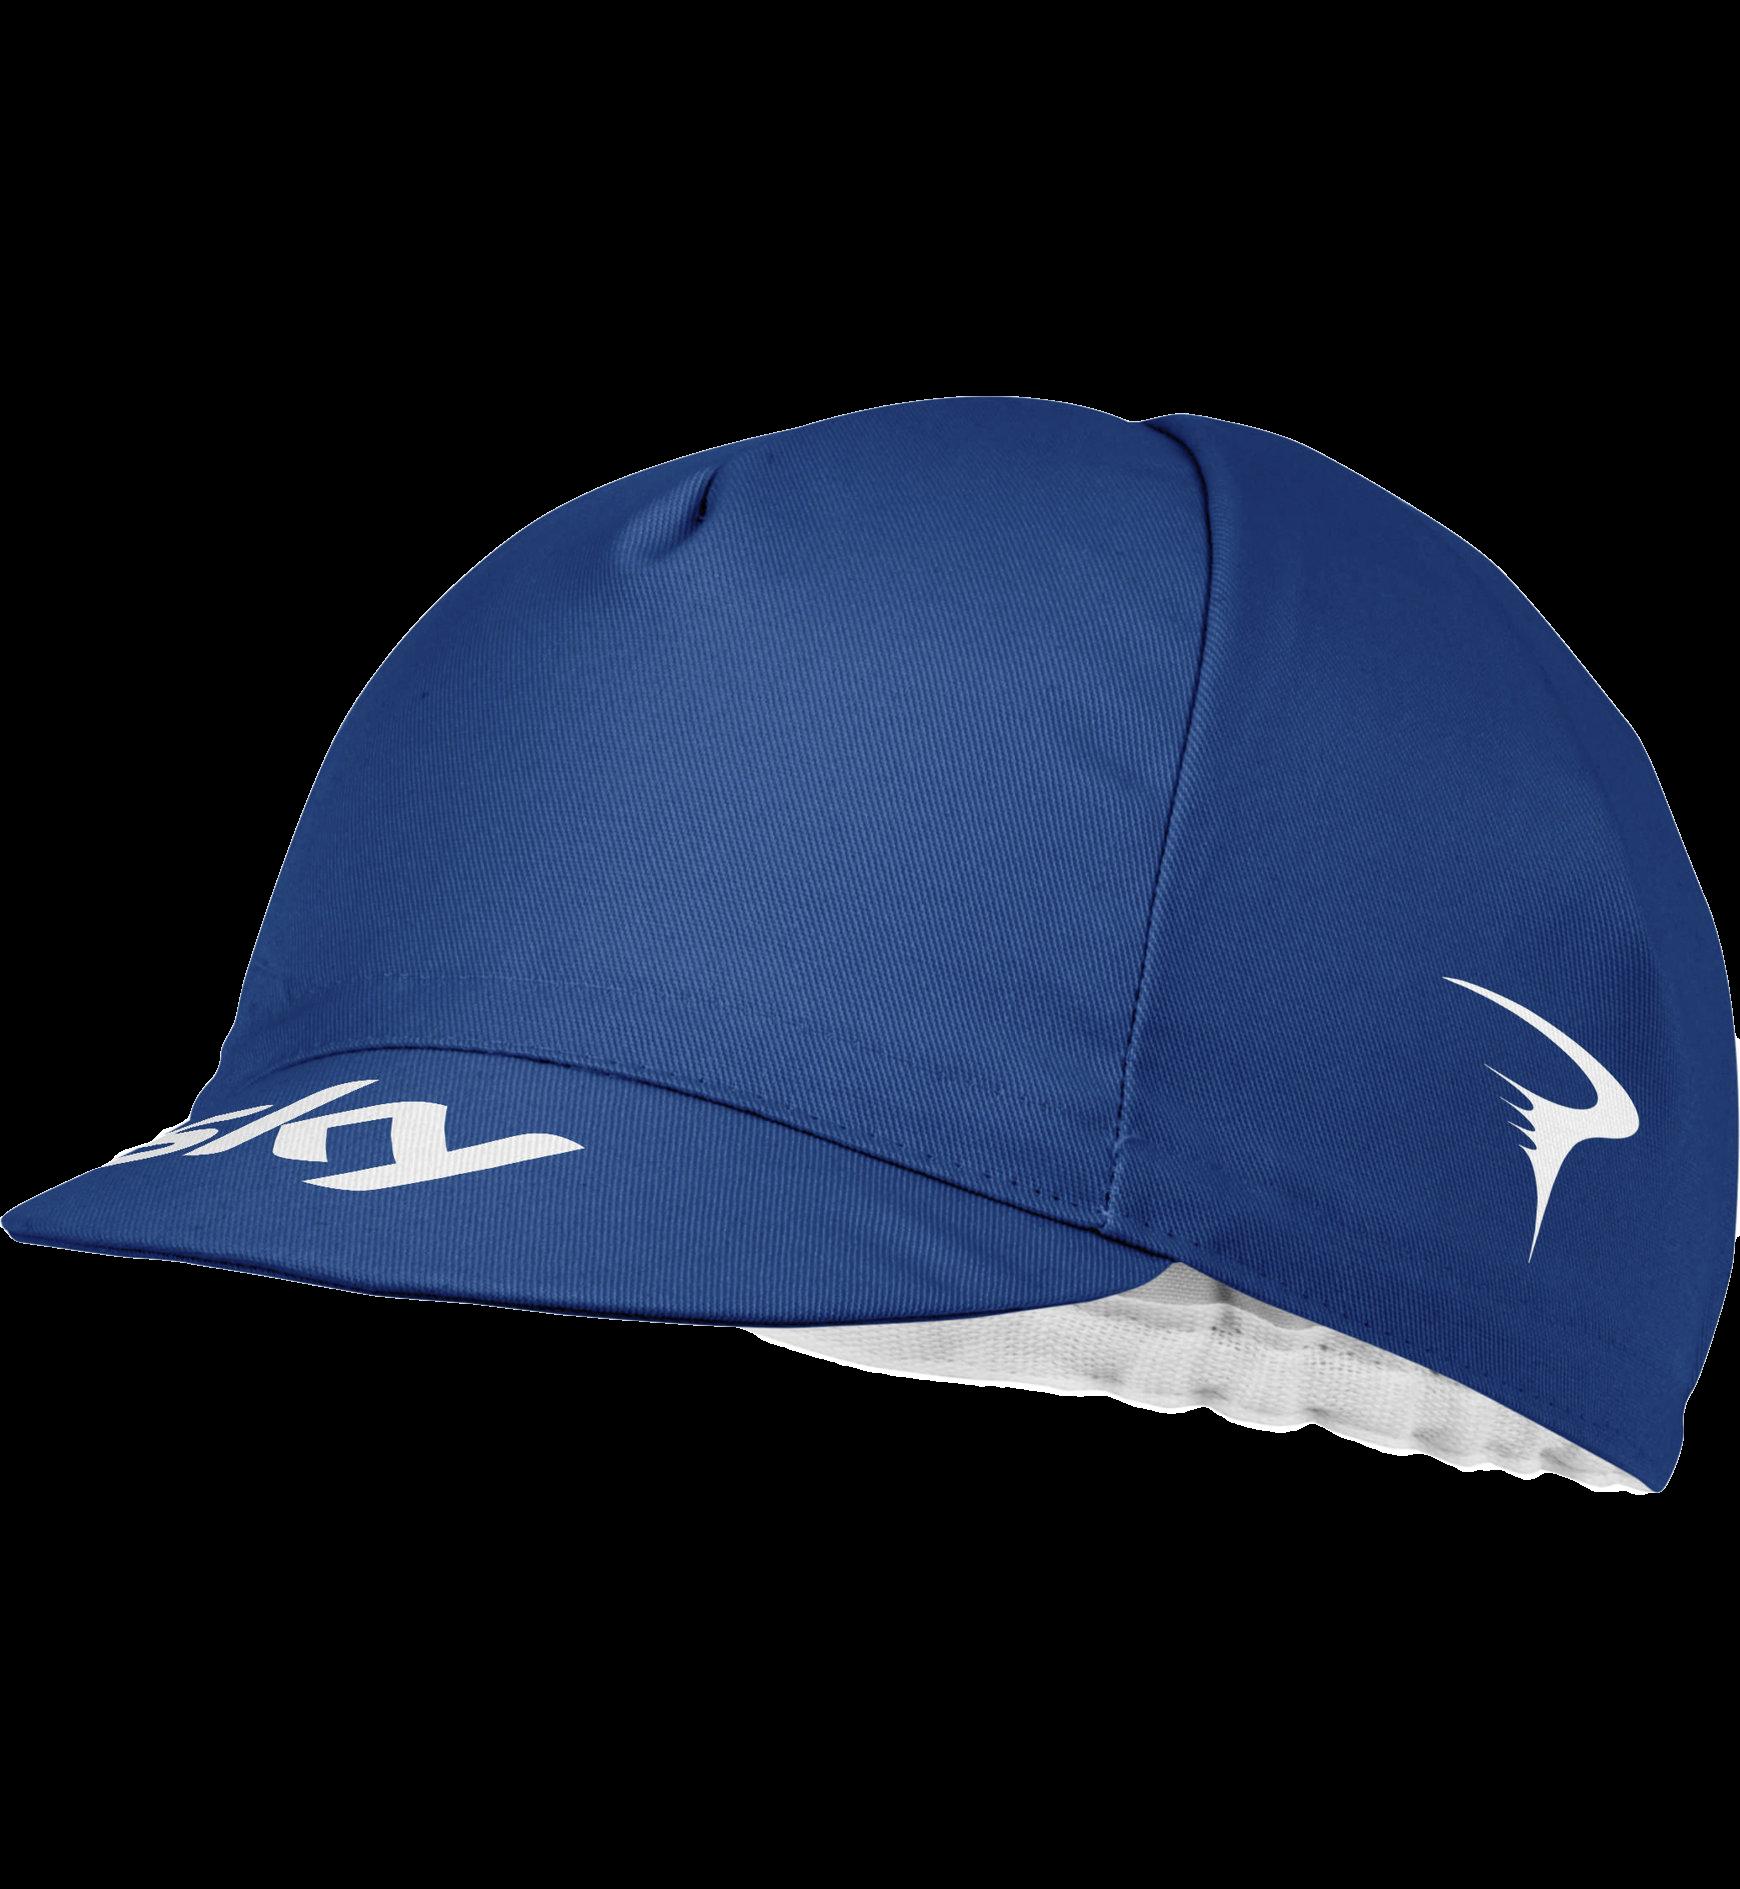 Castelli Team Sky 2019 Cycling Cap - Radkappe